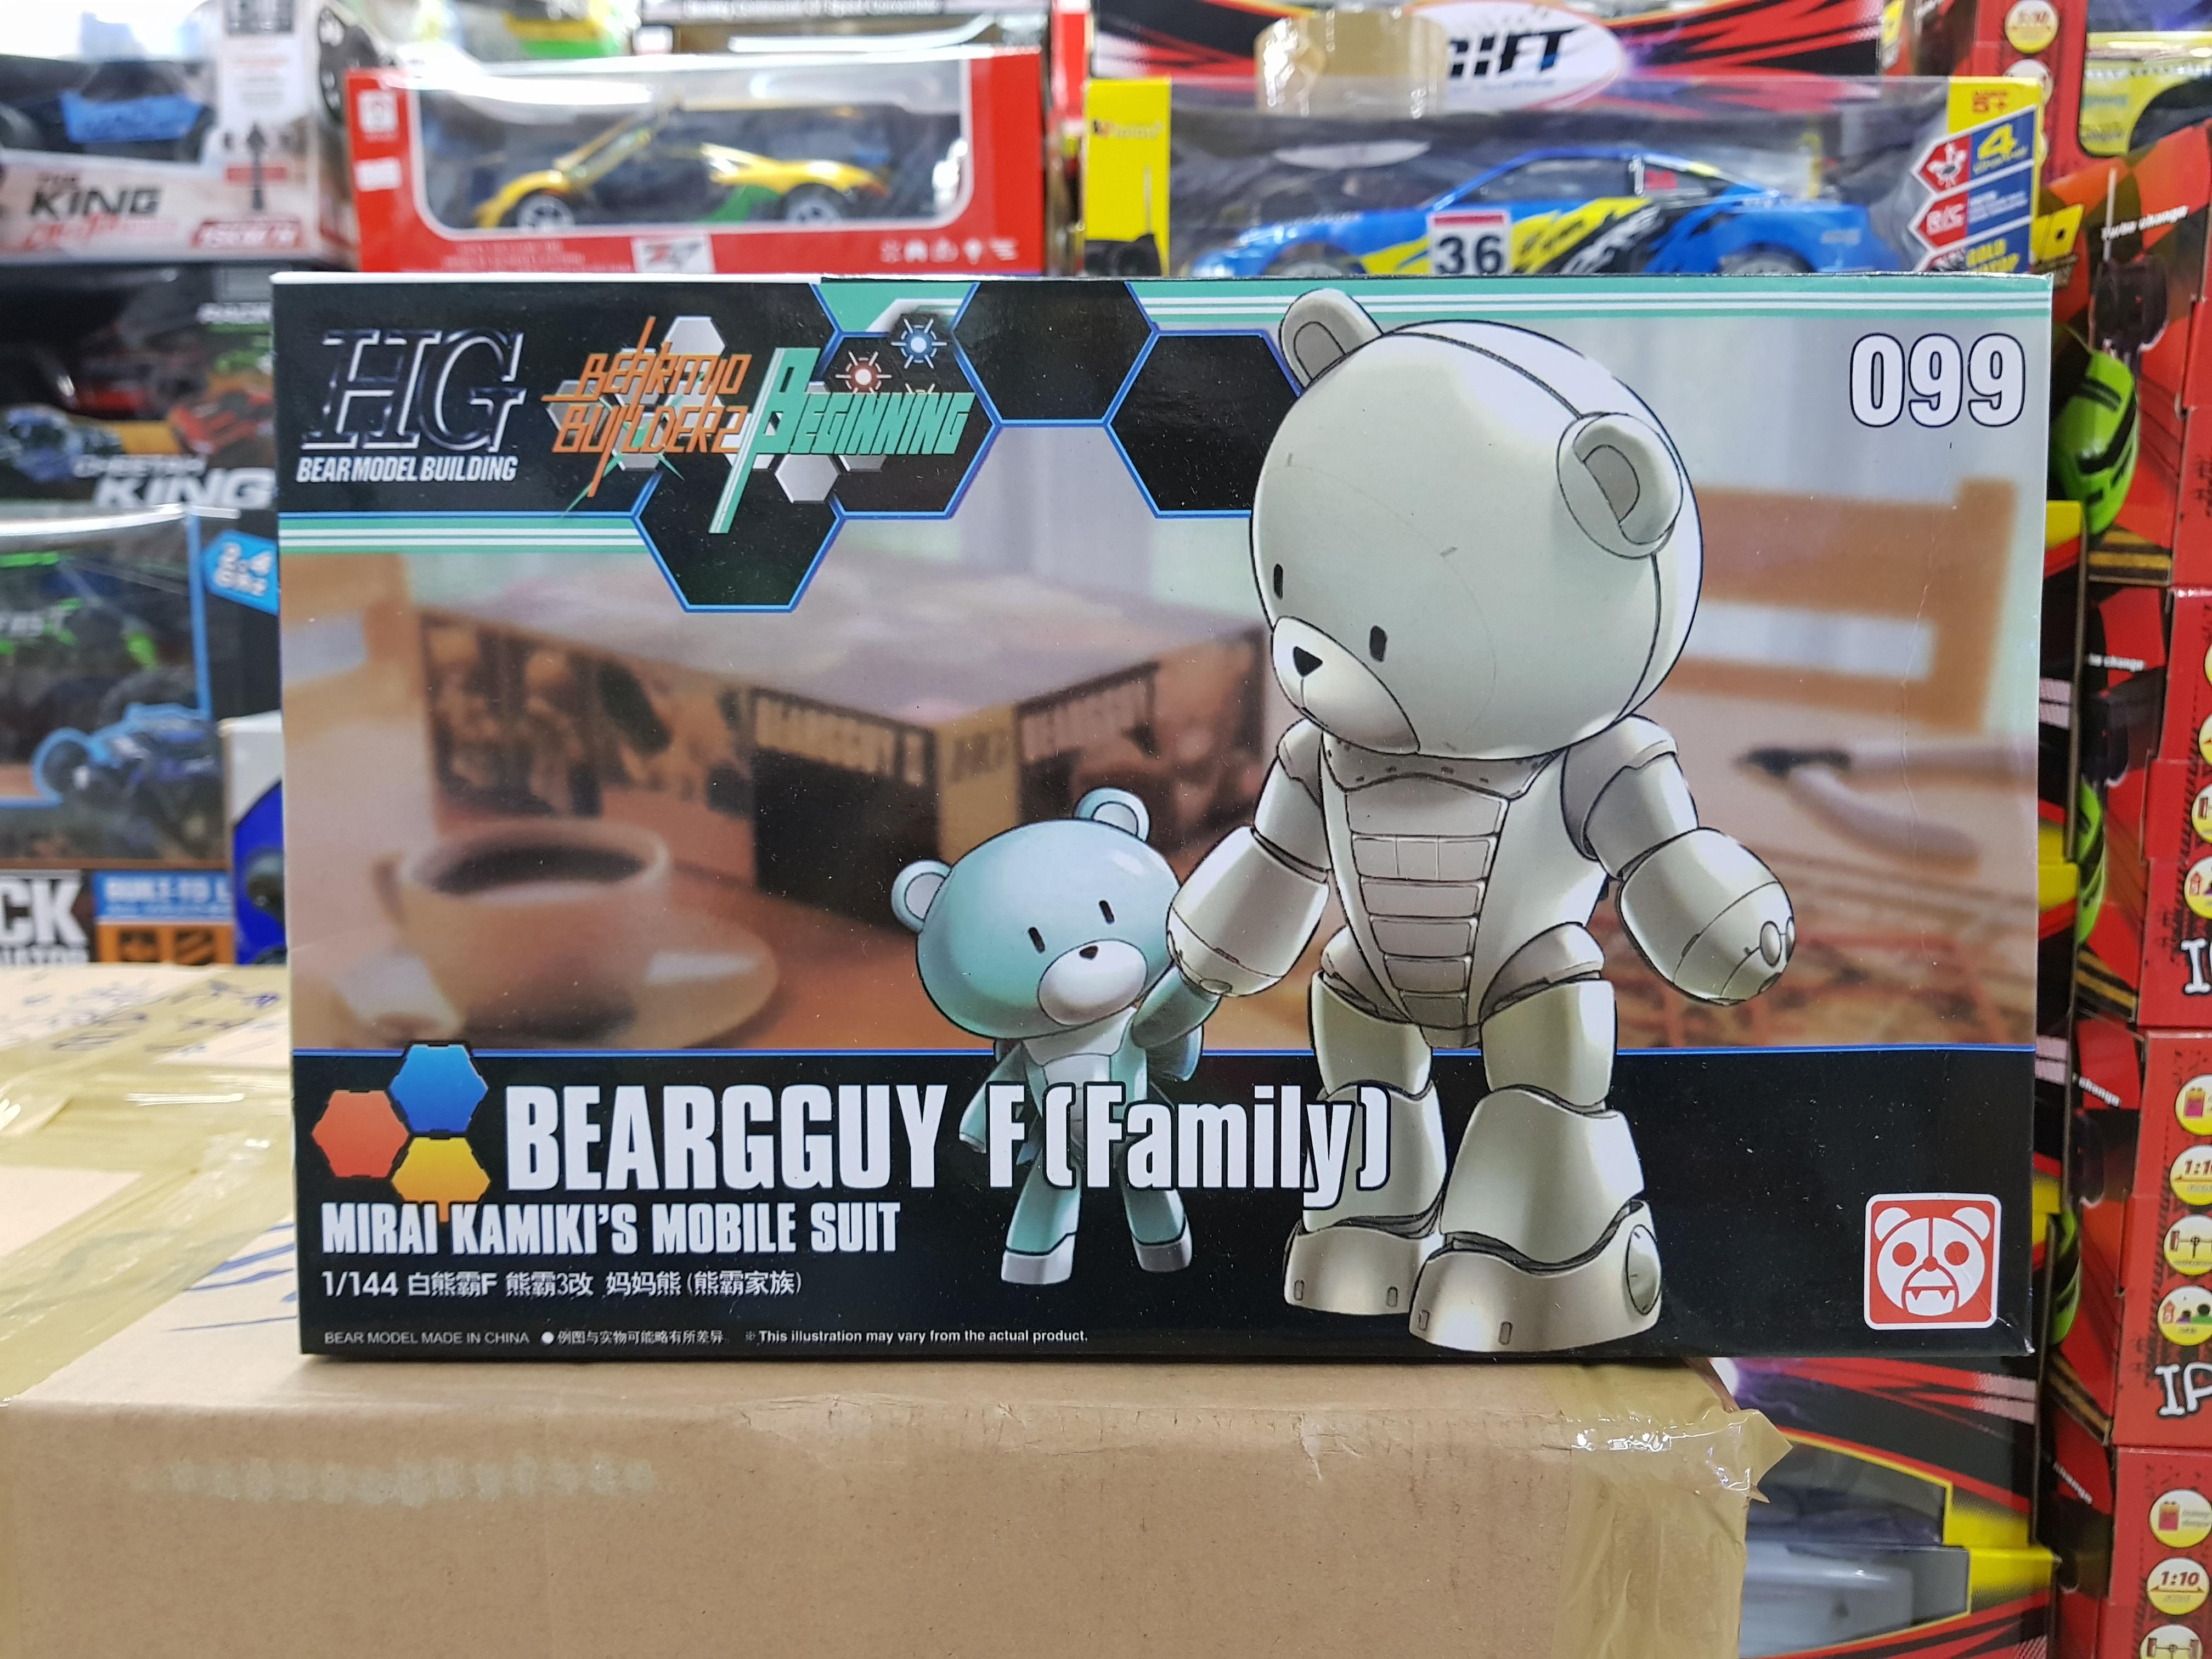 BEARGGUY F[FAMILY]